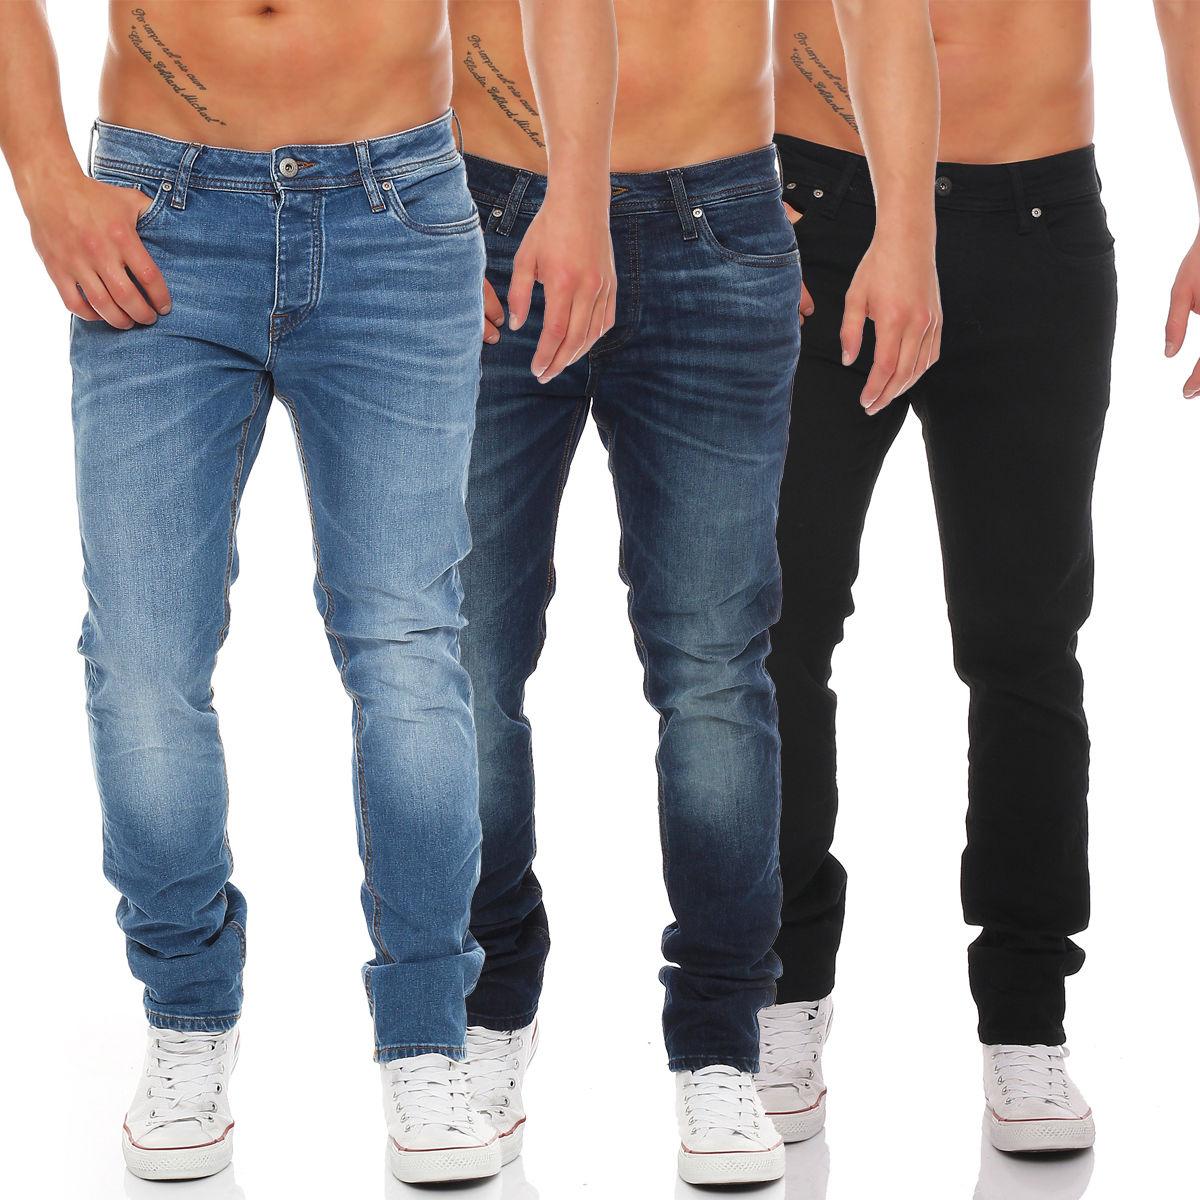 Slim Fit Jeans Pack of 3